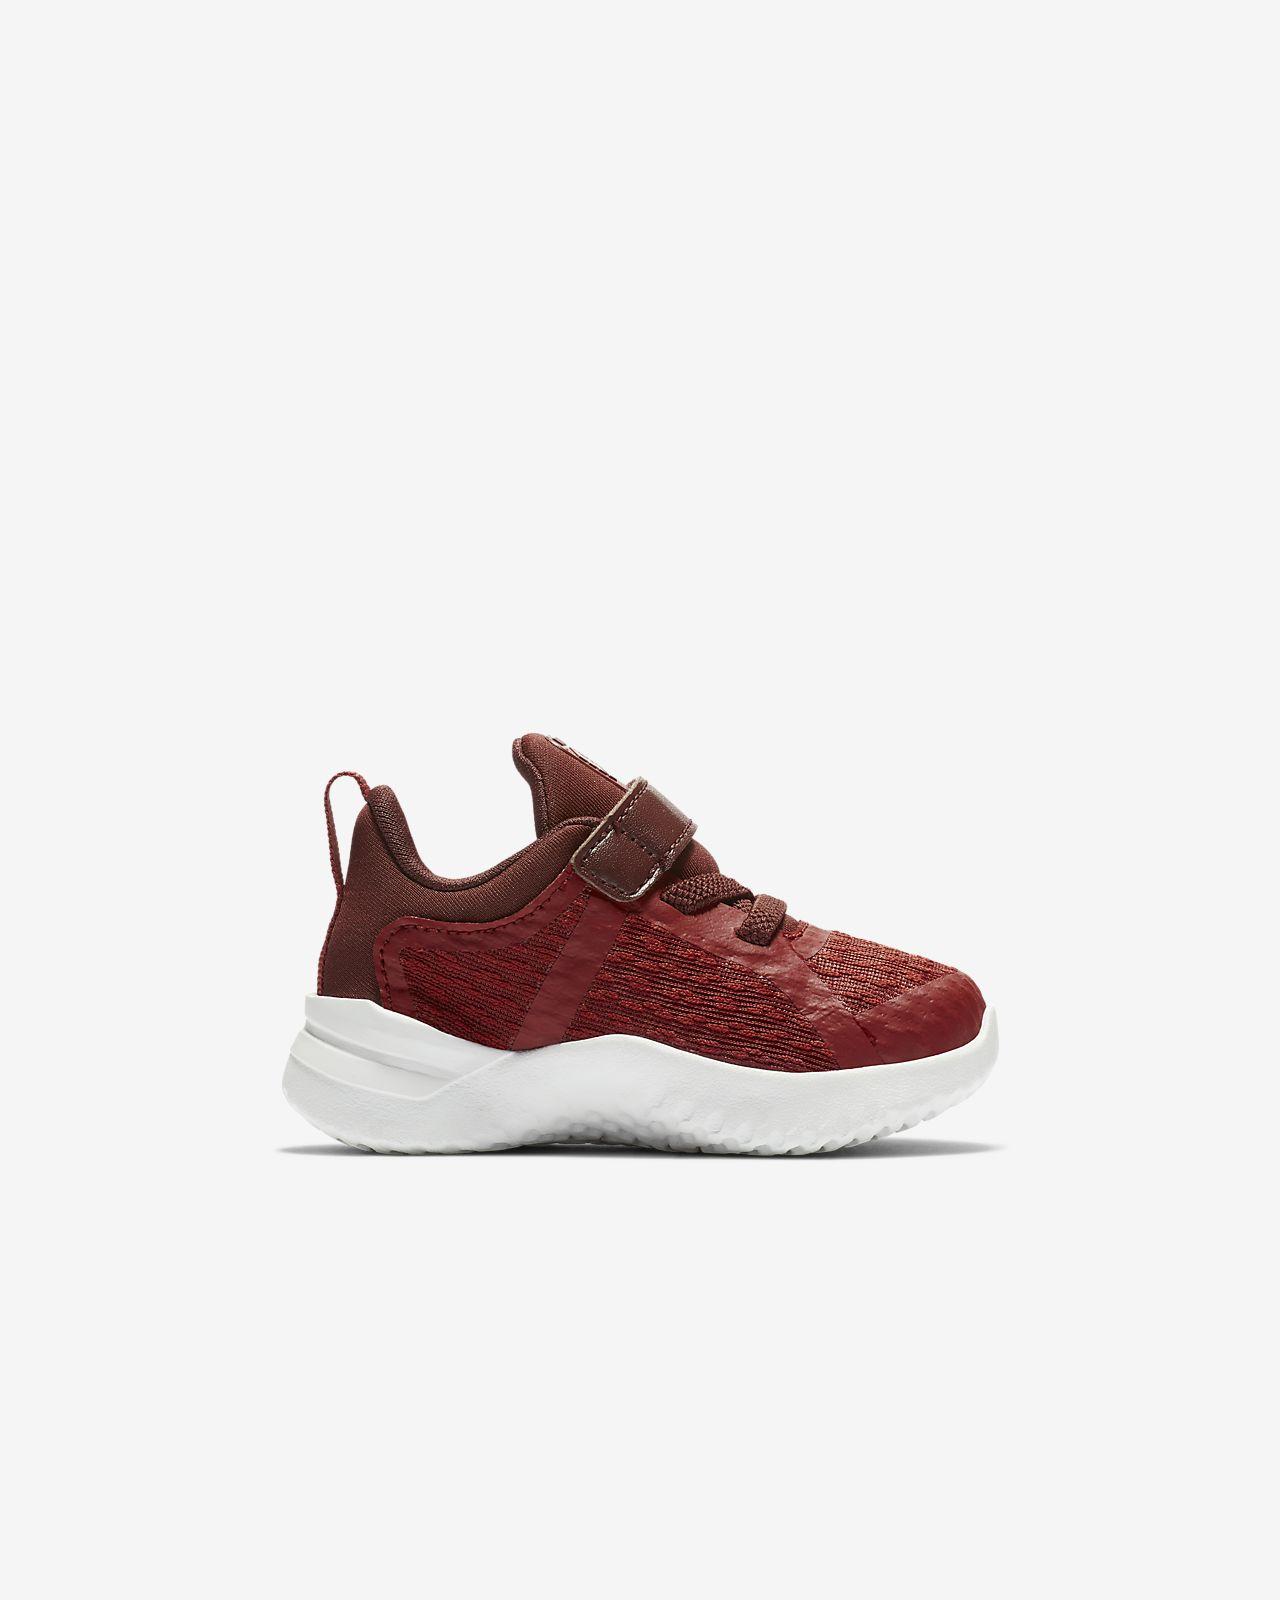 a398b4c319 Nike Rival Baby & Toddler Shoe